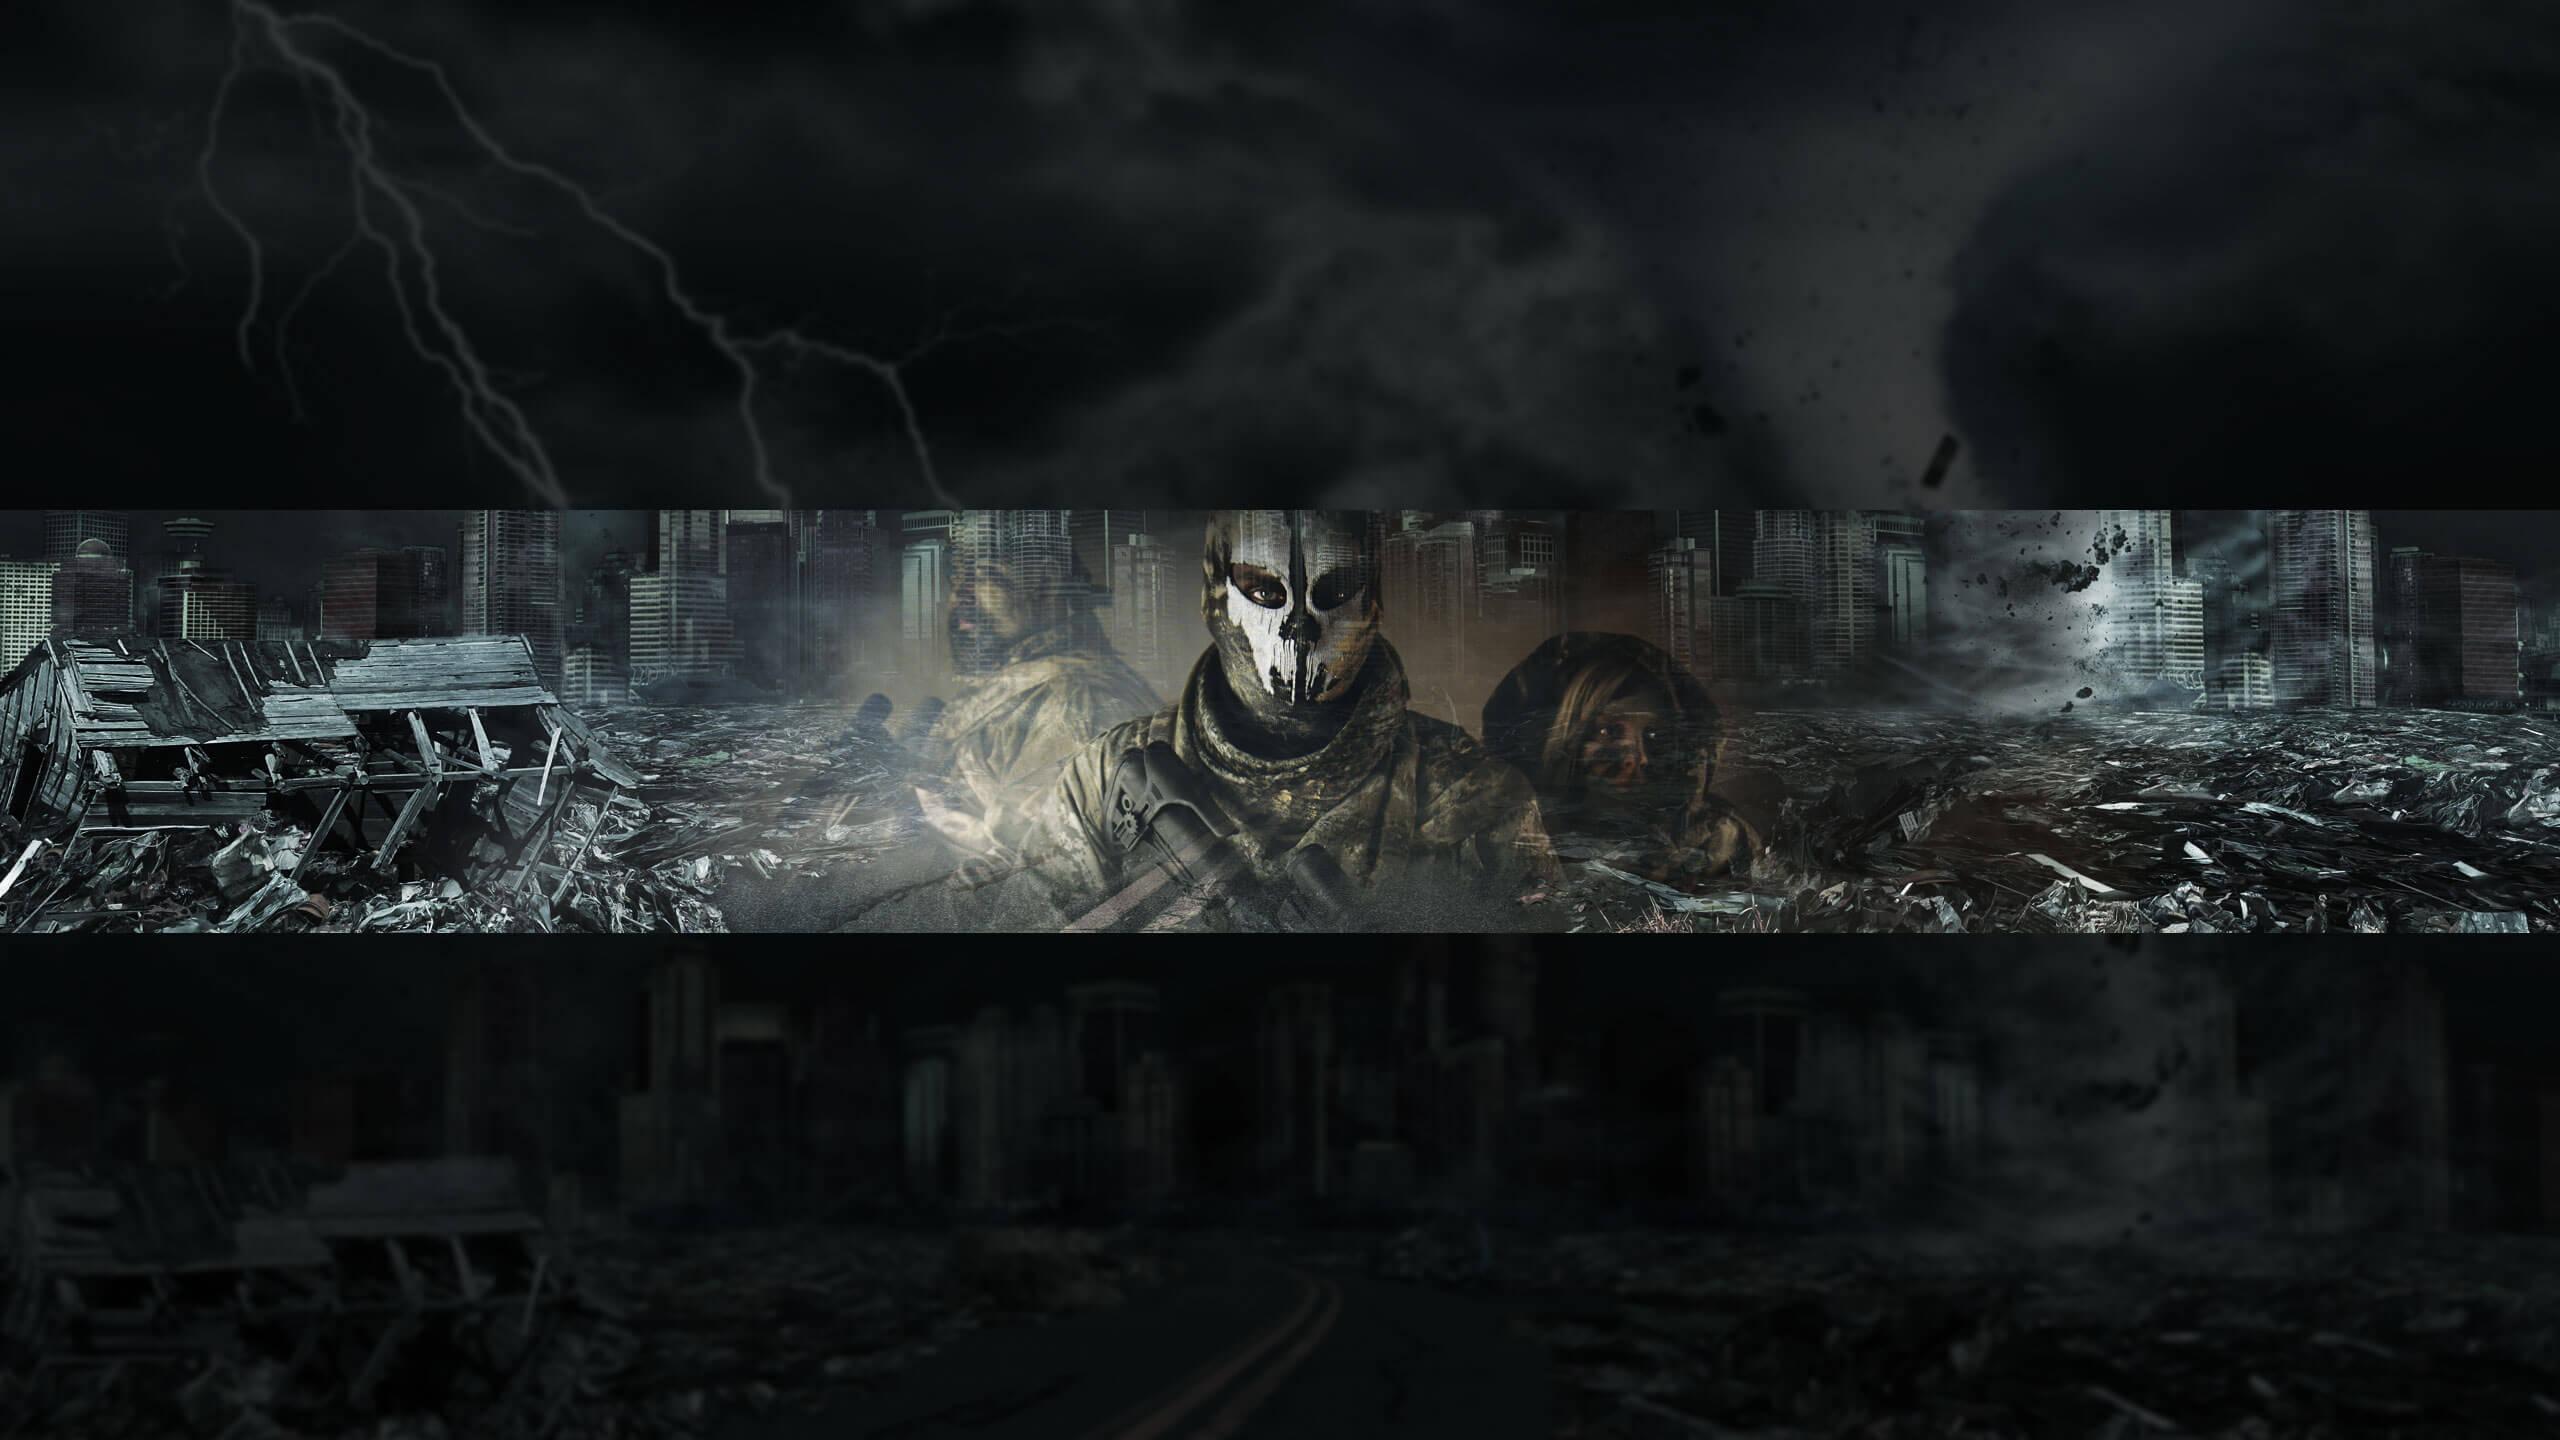 Картинка с городскими руинами для шапки ютуба КС ГО